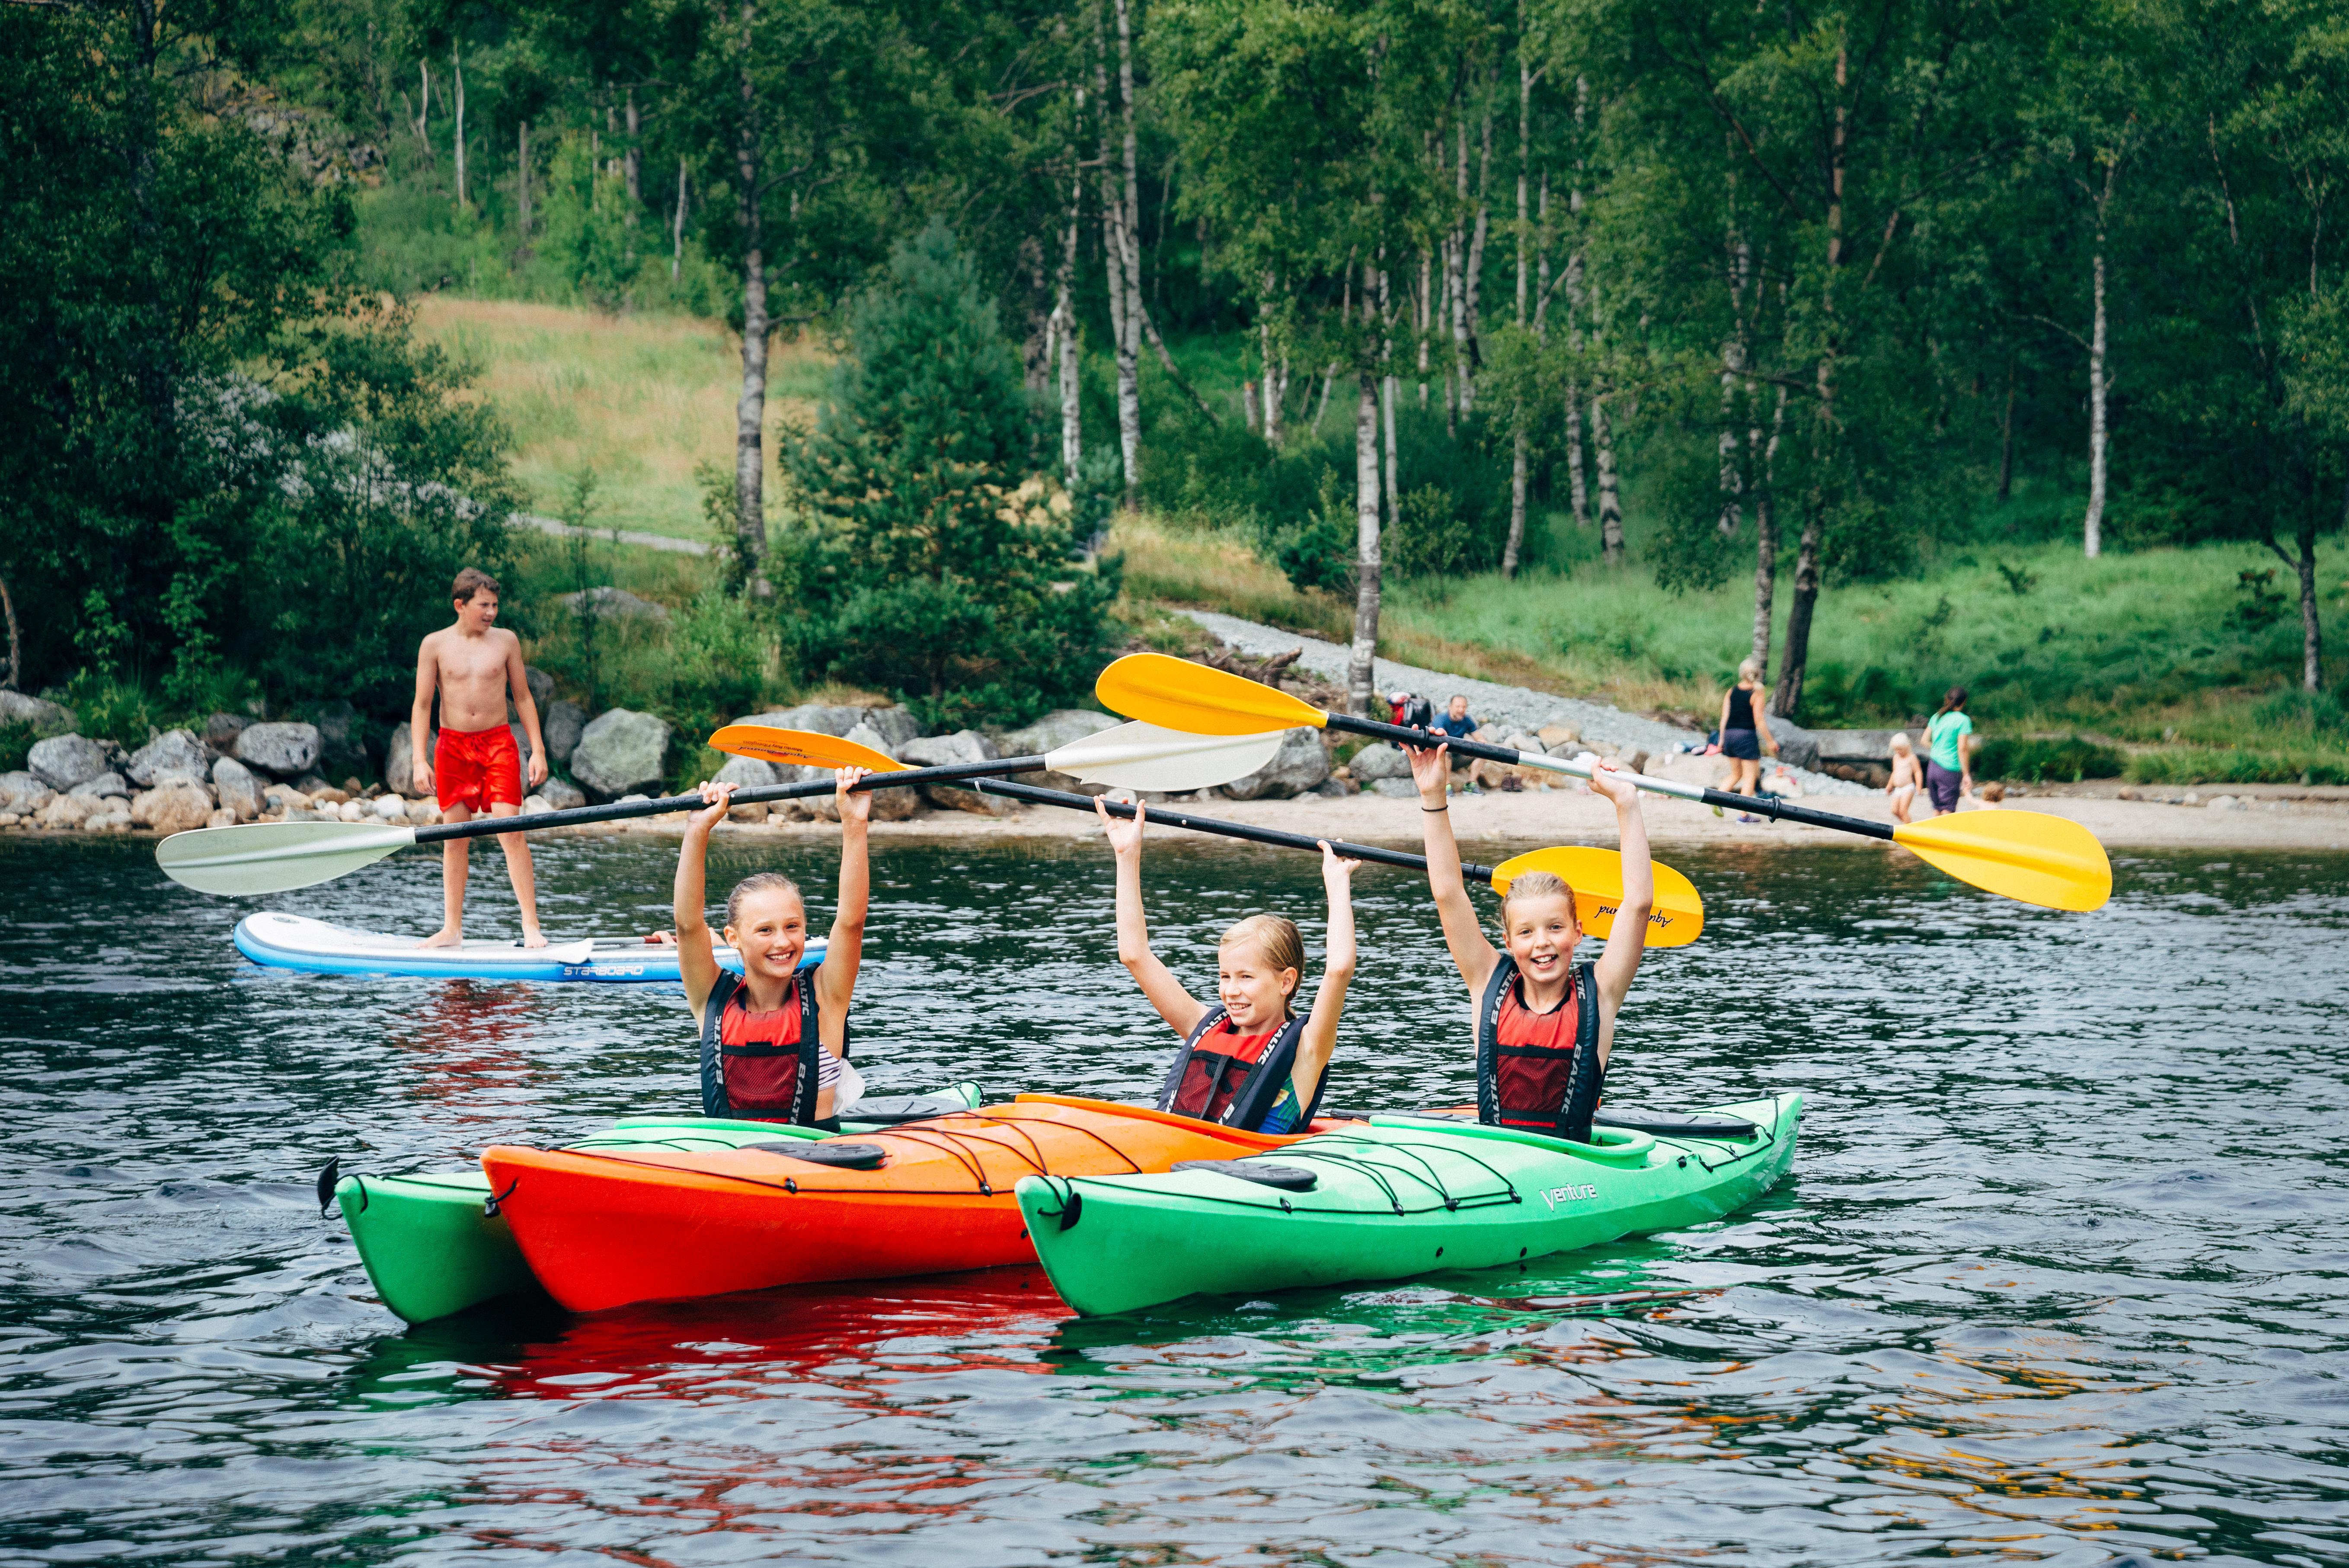 9aeb6117 Newtoncamp (424) — Turer og aktiviteter — Stavanger Turistforening